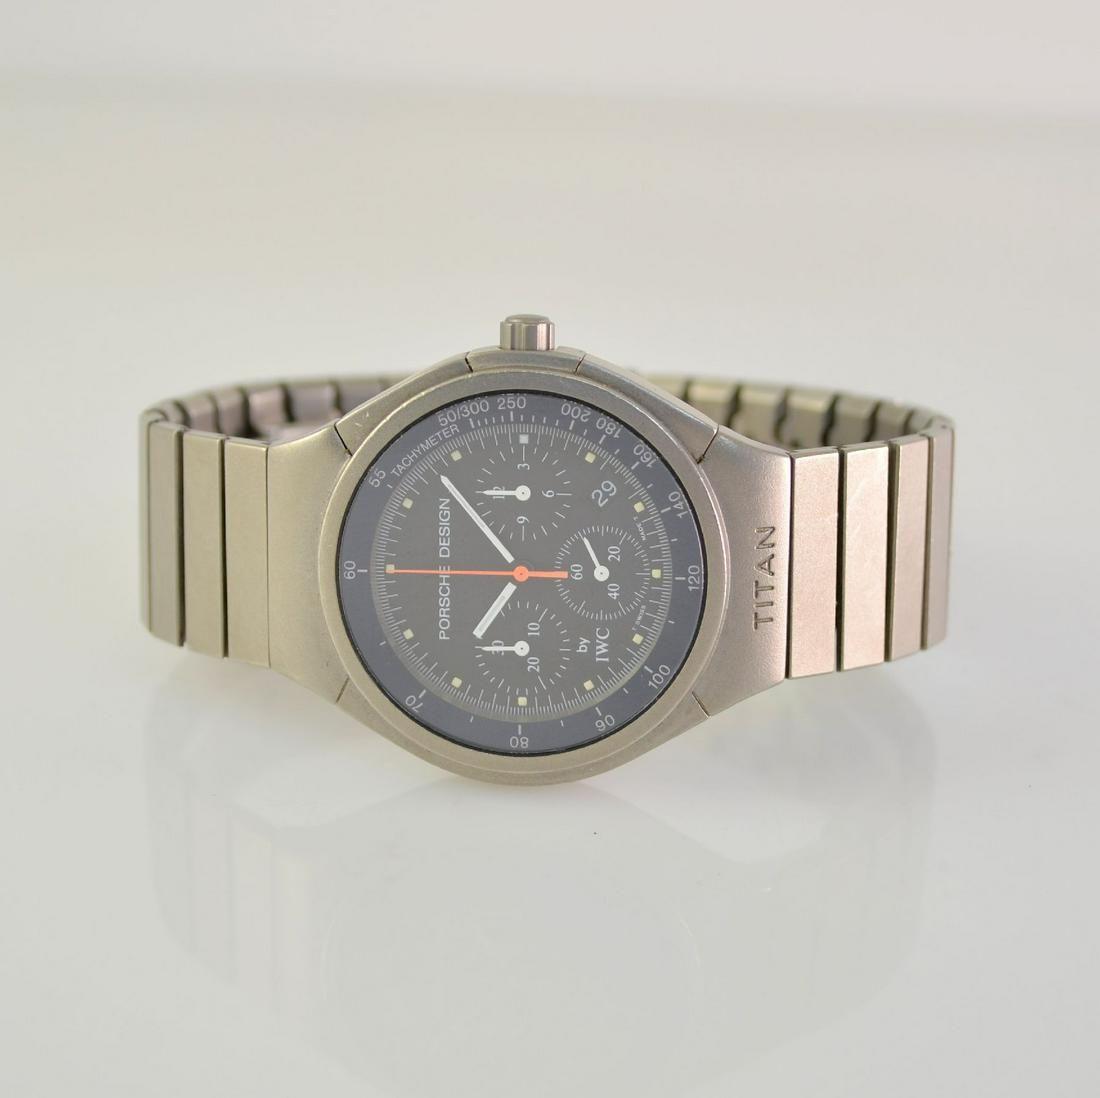 PORSCHE DESIGN by IWC gents wristwatch with chronograph